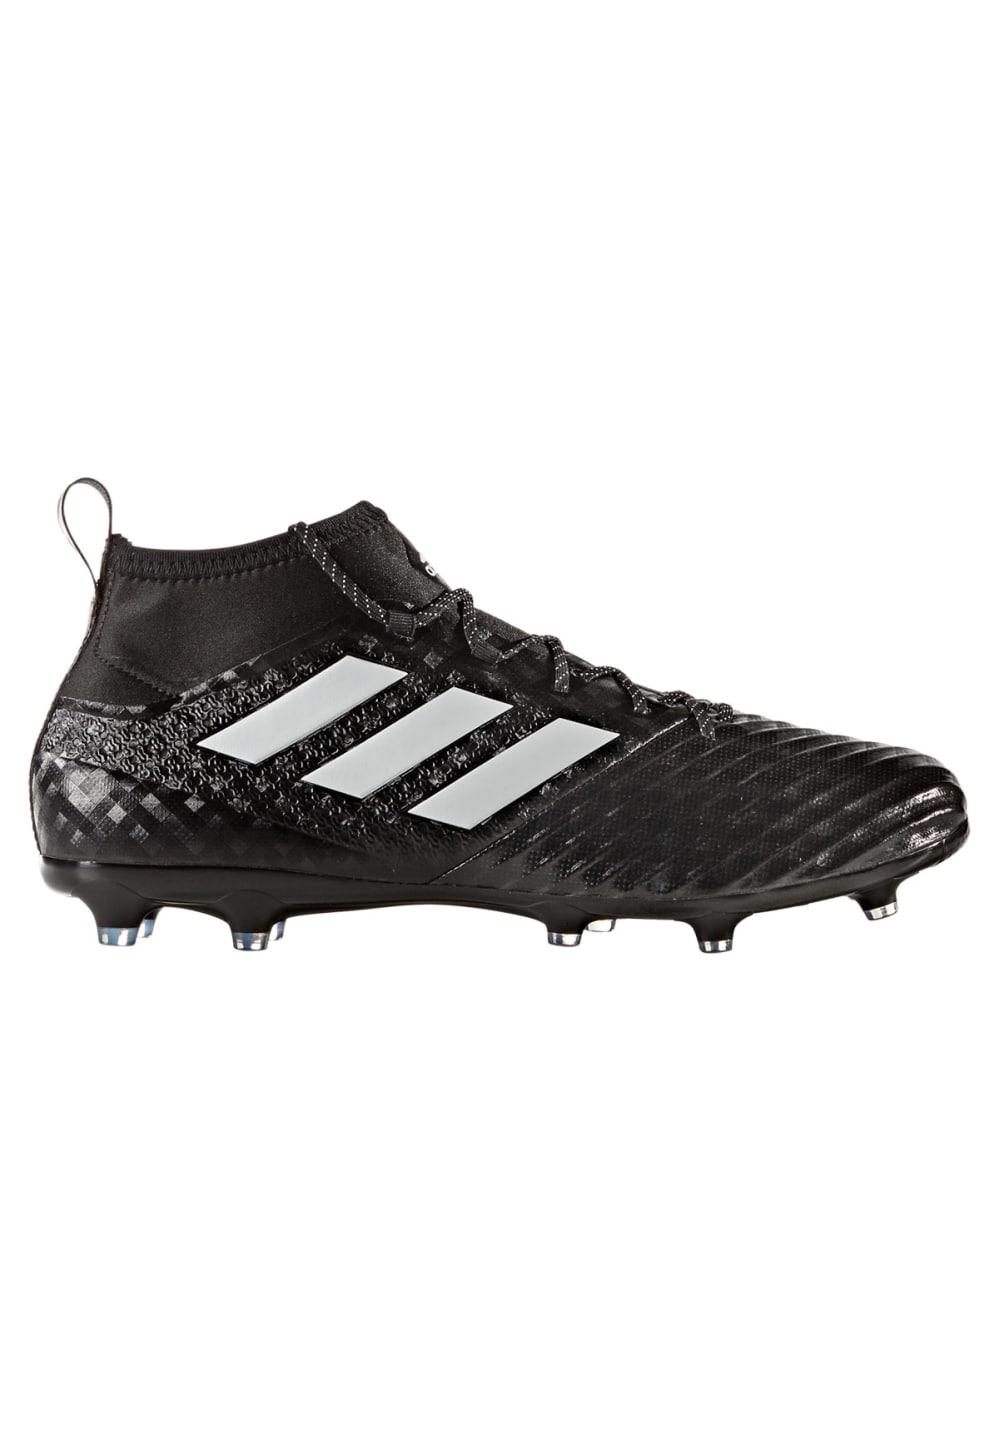 e6063865f adidas ACE 17.2 Primemesh FG - Football Shoes for Men - Black